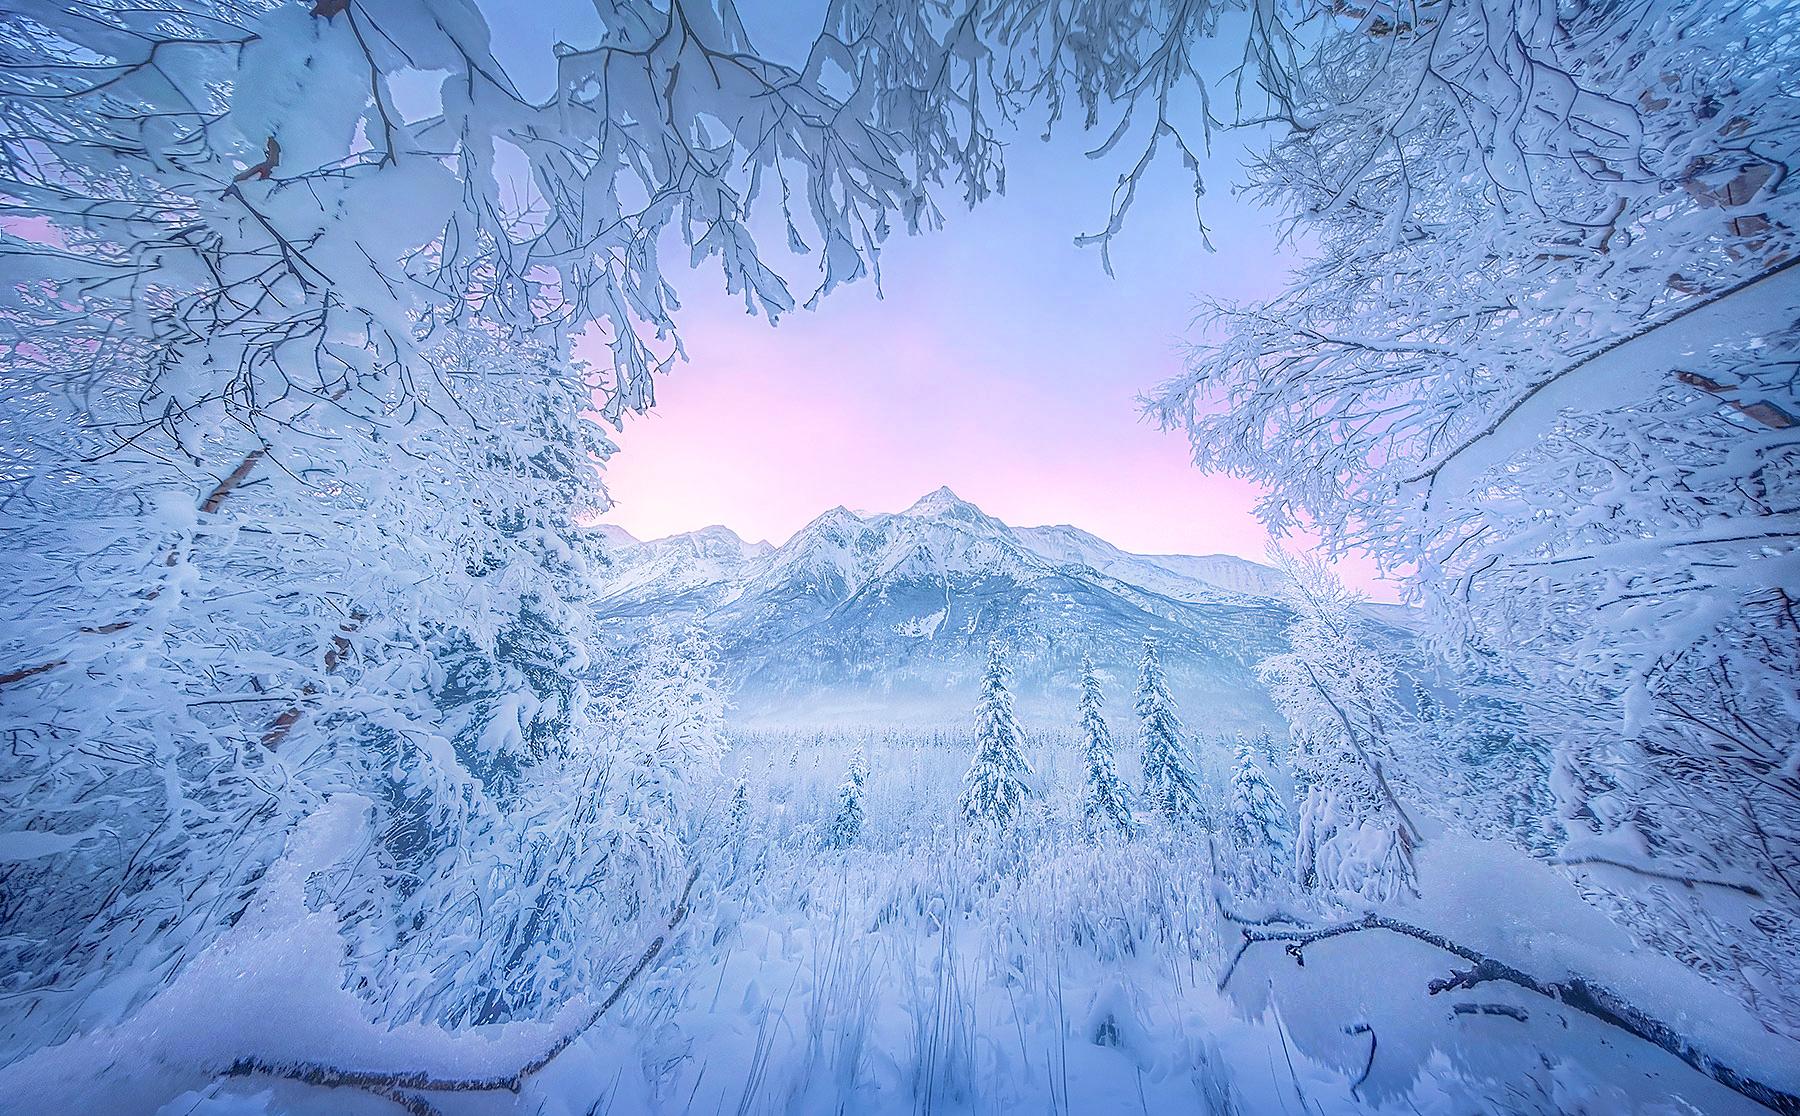 Seasons greetings from Alaska.